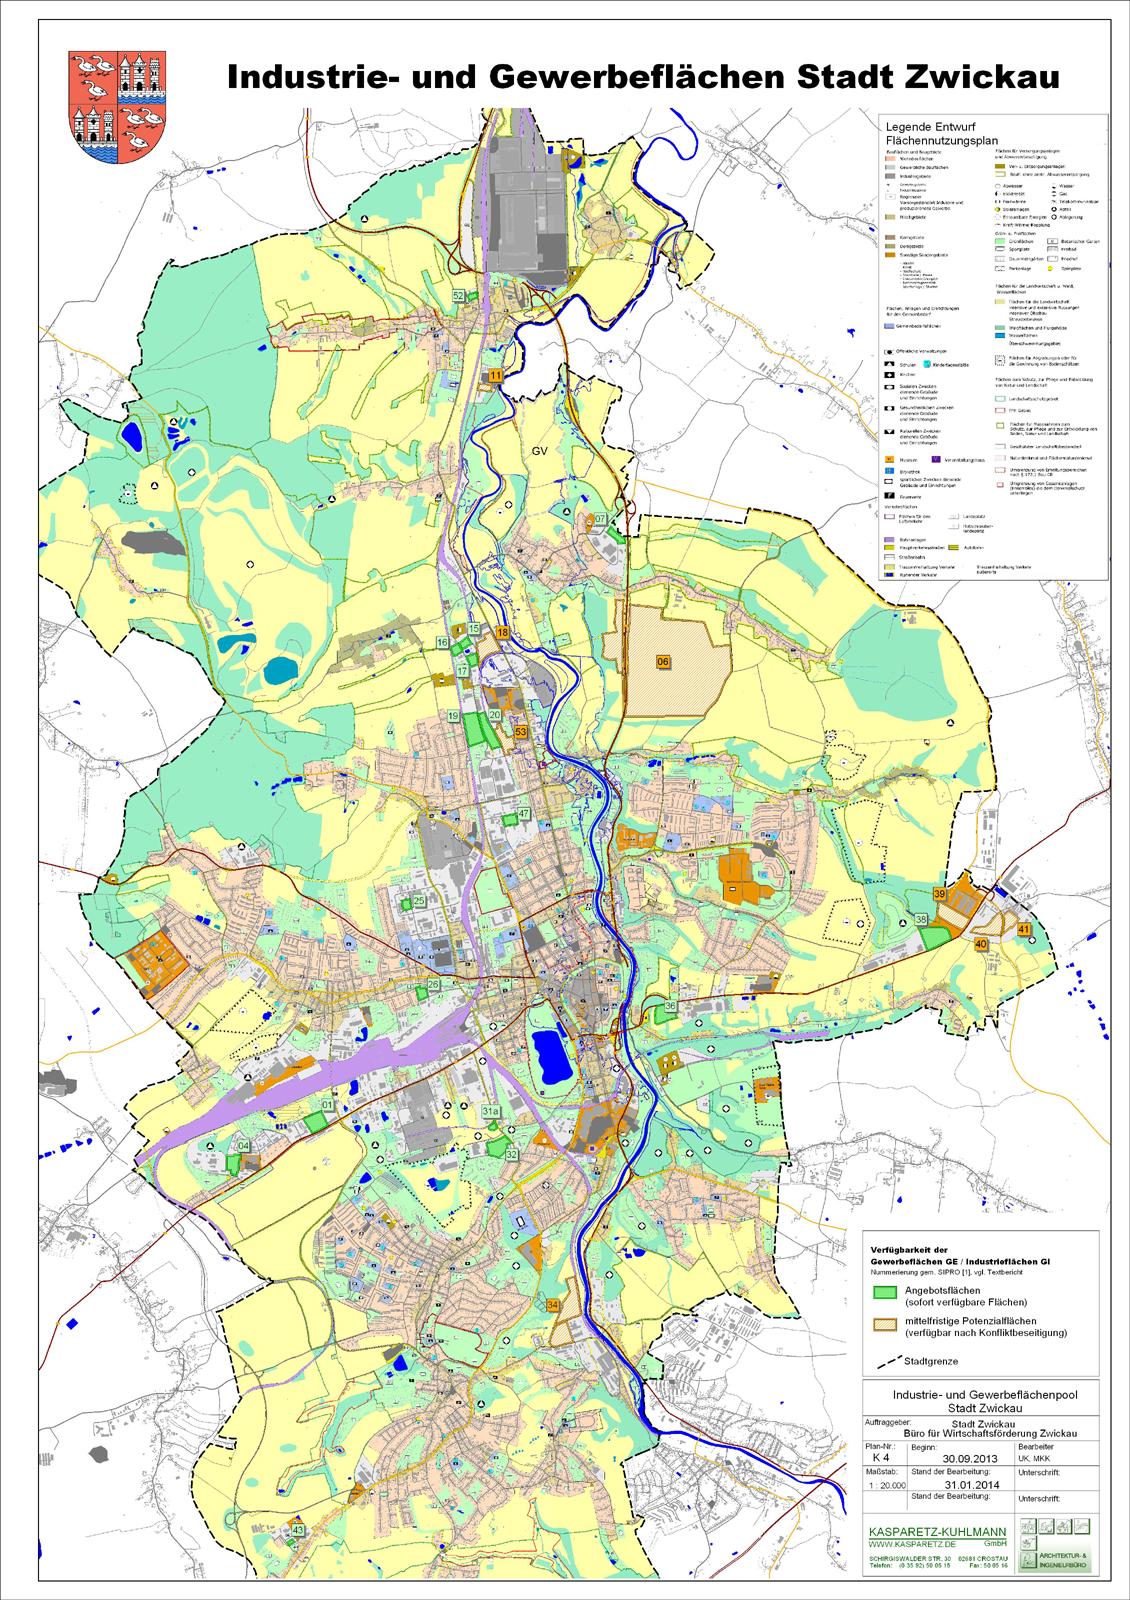 Zwickau Karte.Kasparetz Kuhlmann Ingenieurbüro Gewerbeflächenstudie Stadt Zwickau